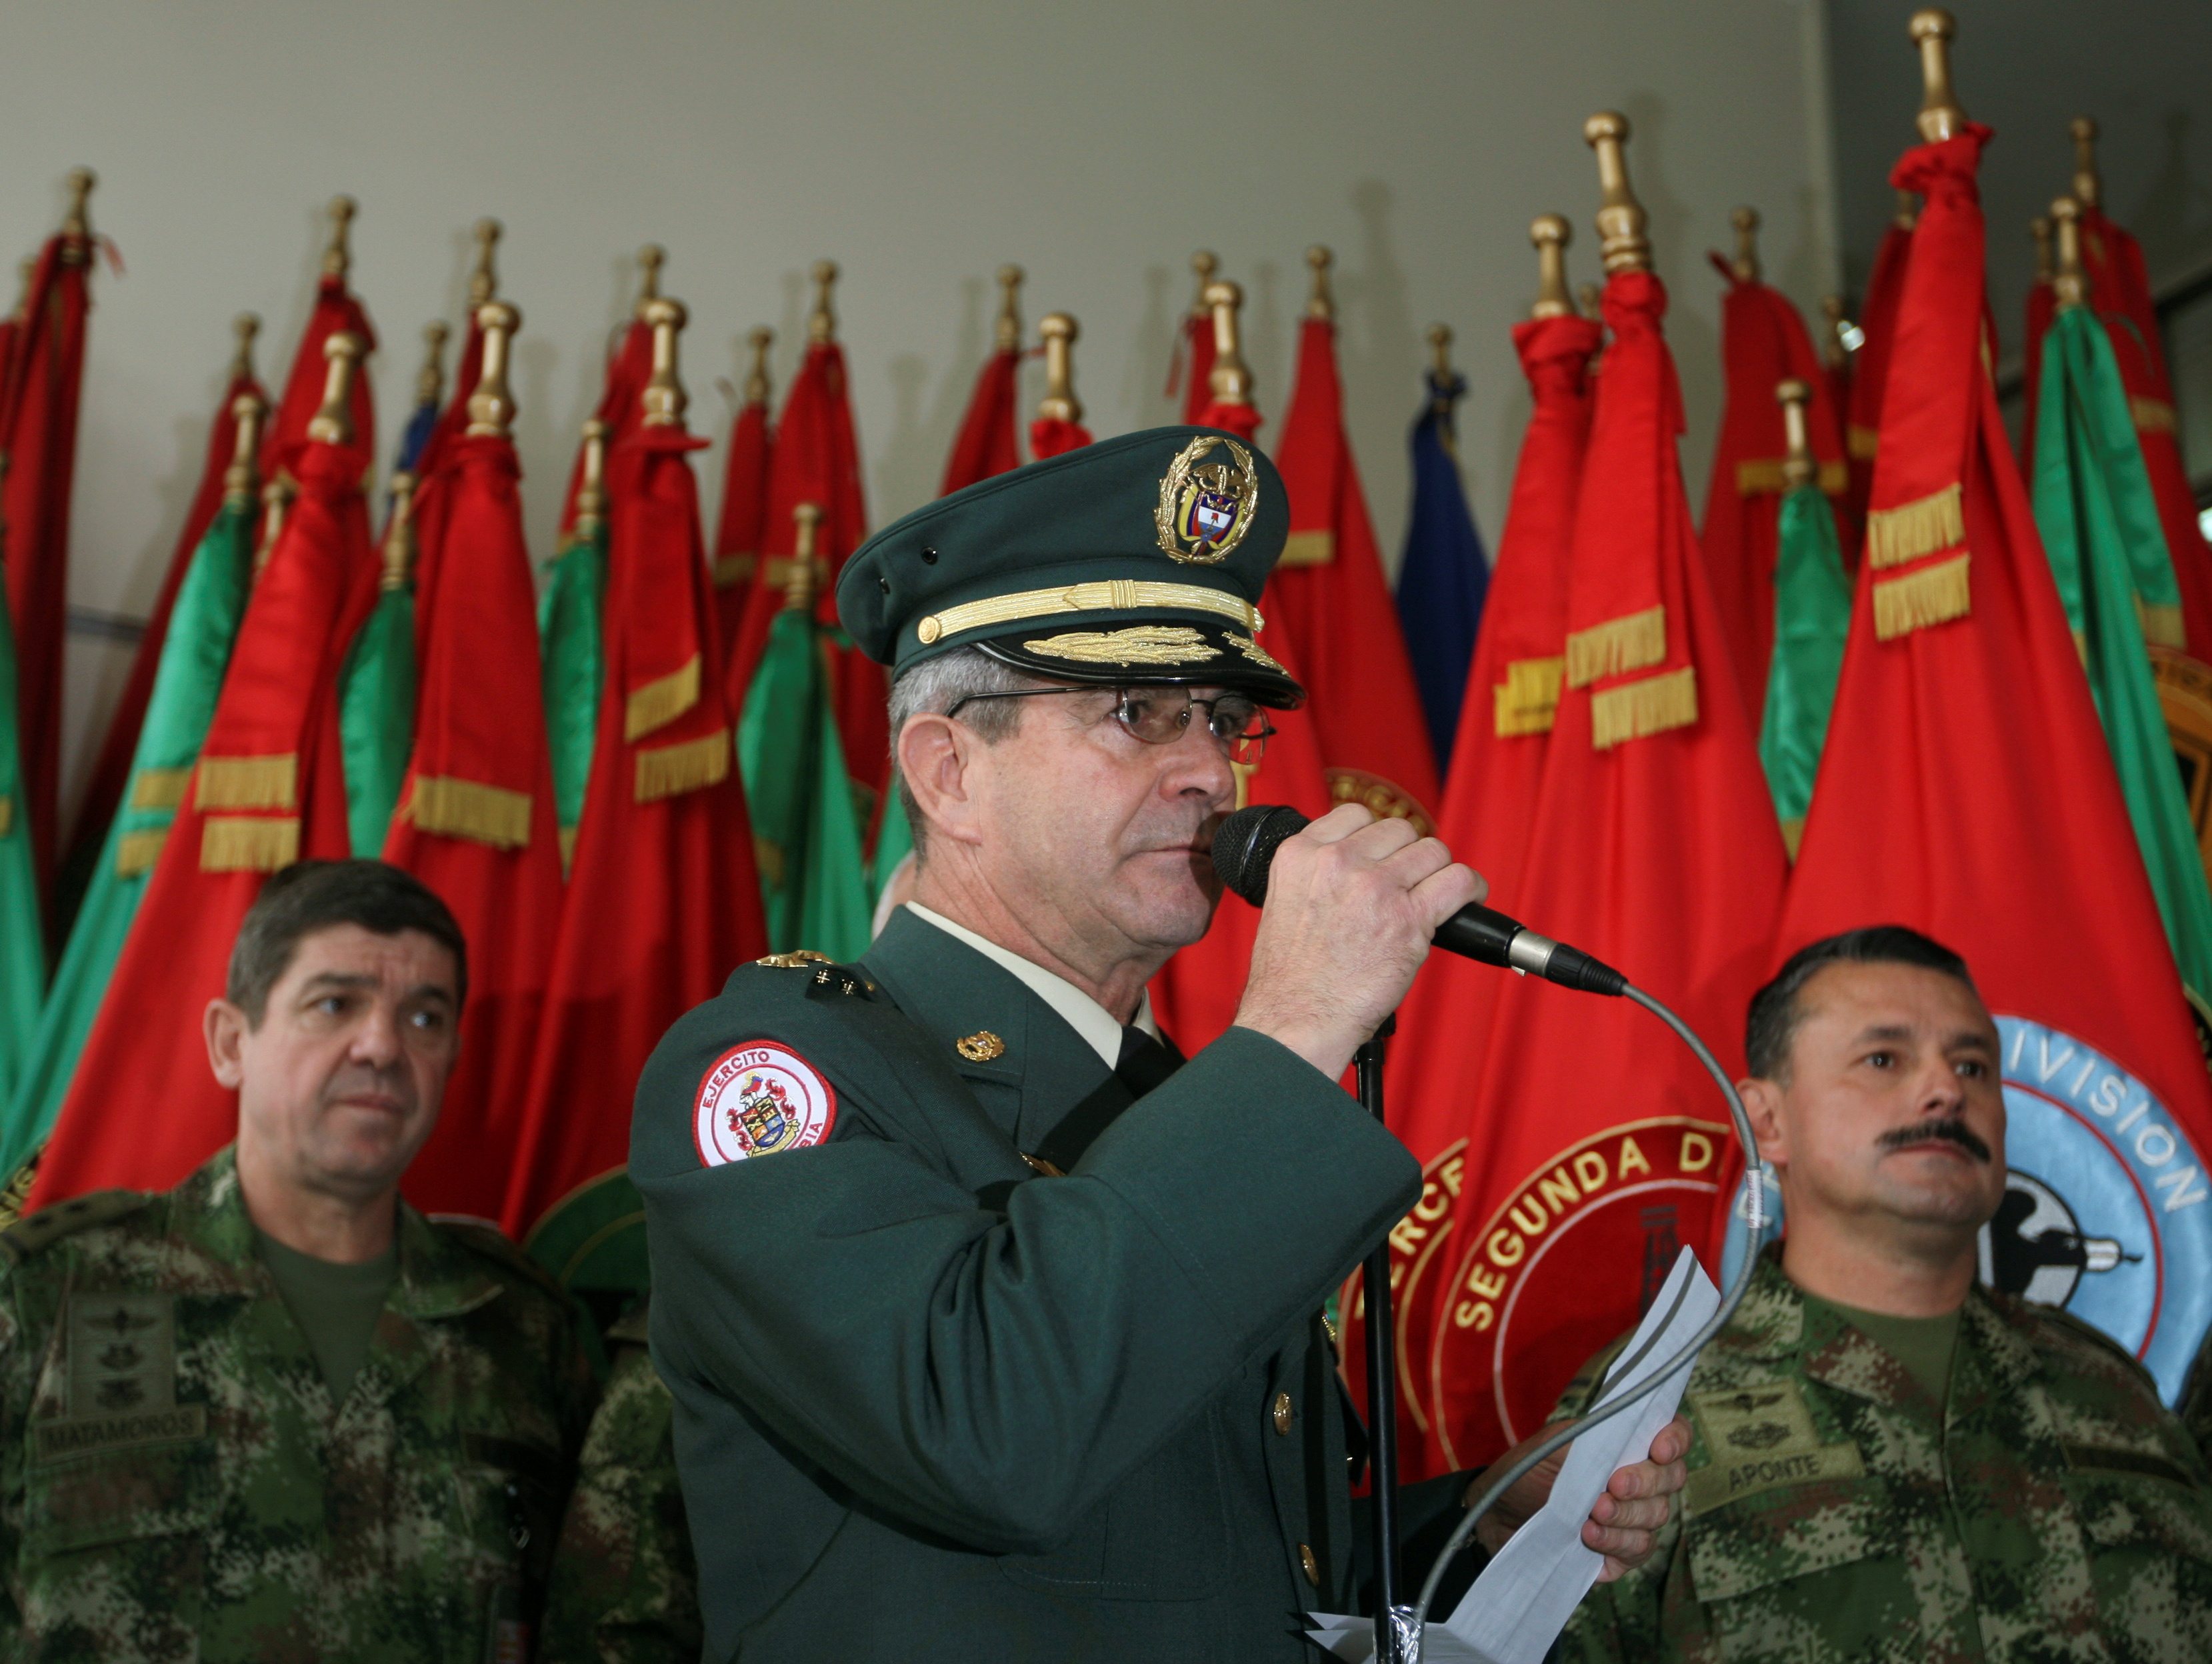 Colombia's army commander General Mario Montoya speaks to the media in Bogota, November 4, 2008. REUTERS/Jose Miguel Gomez/File Photo